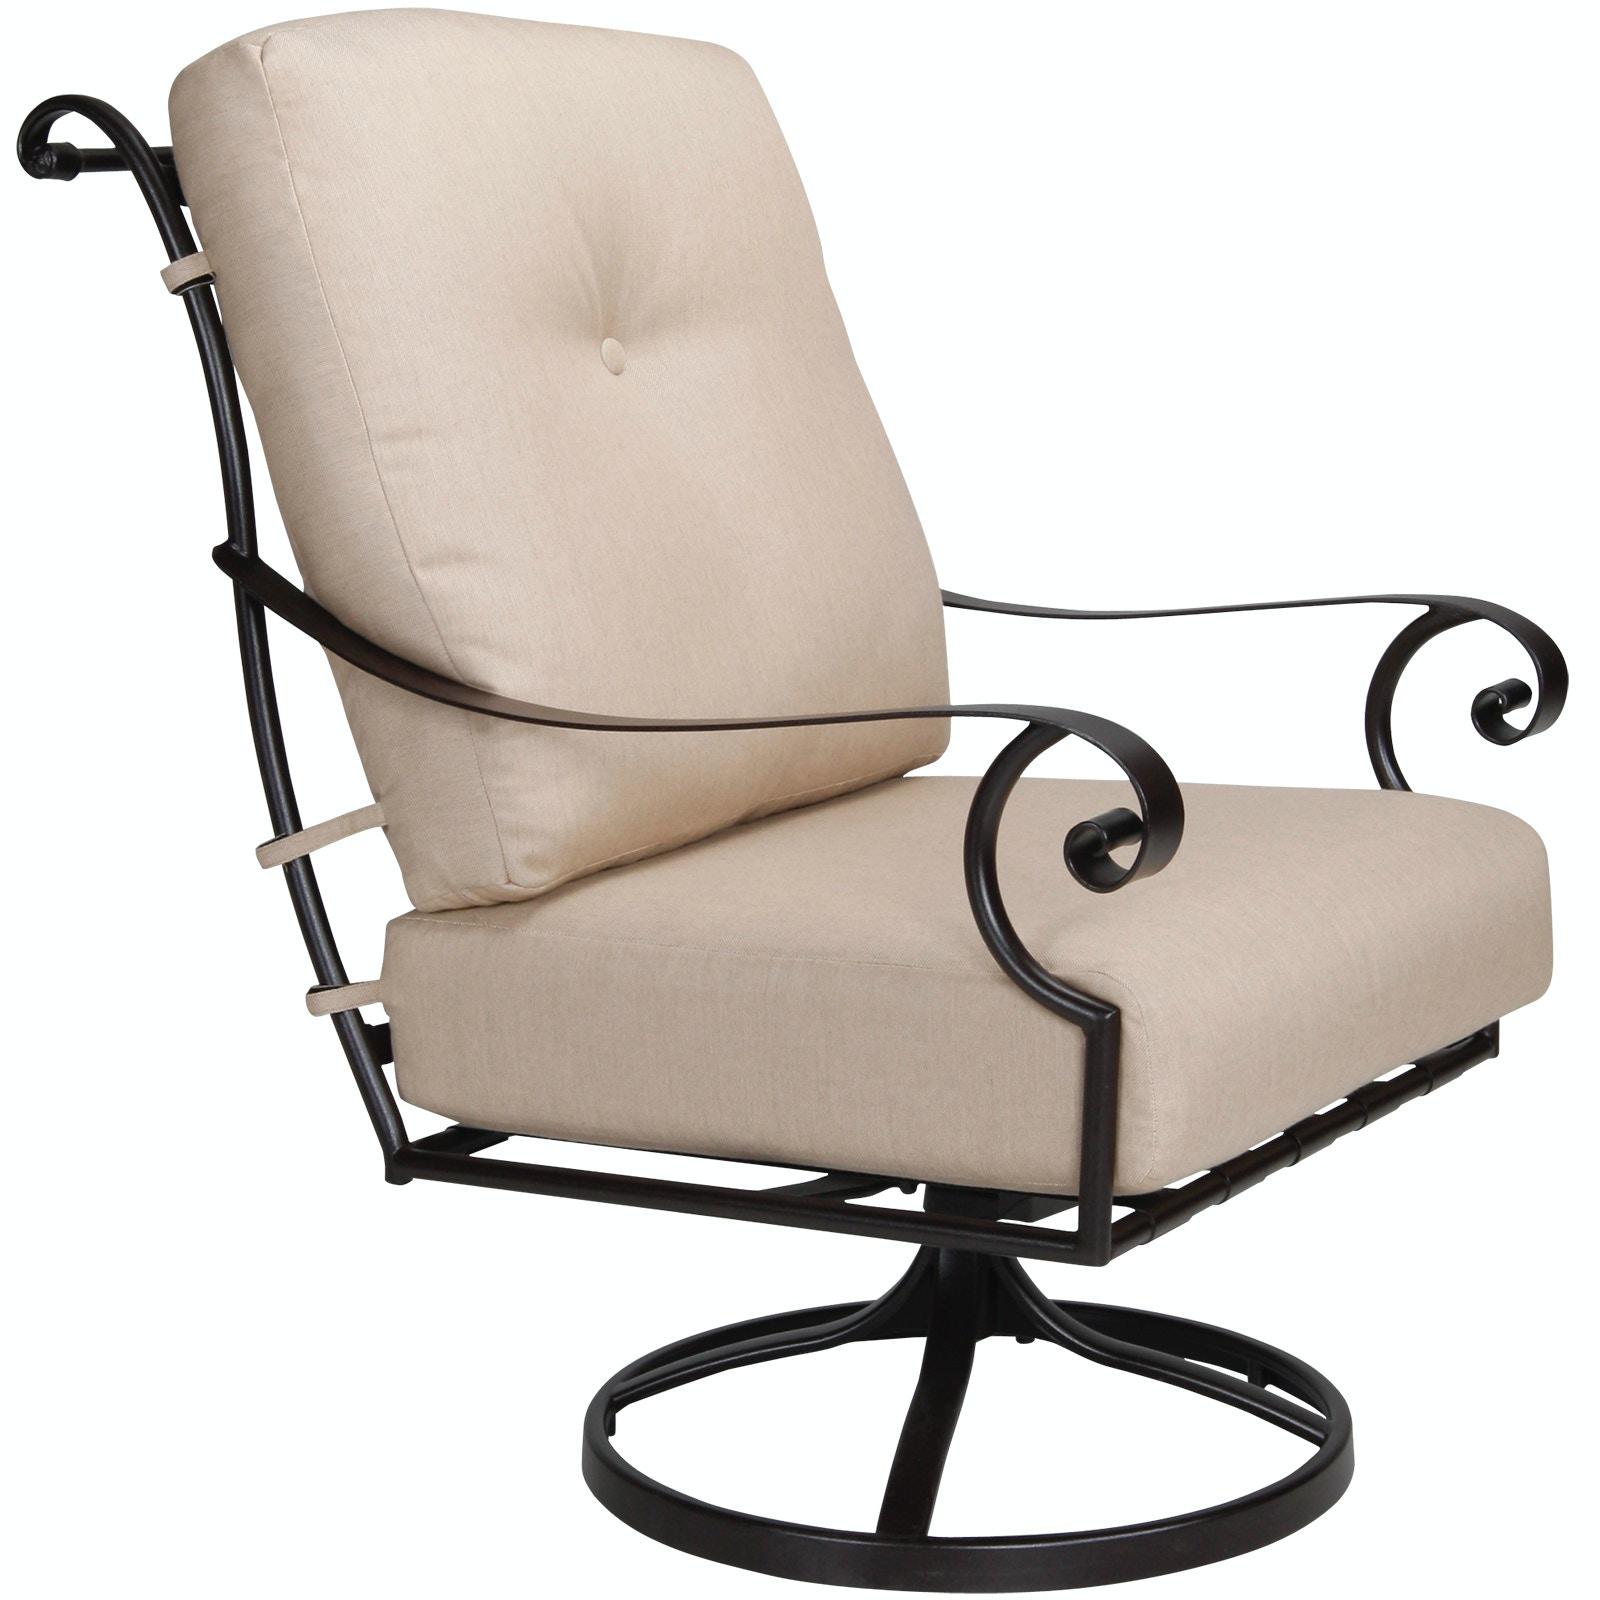 OW Lee Furniture St. Charles Swivel Rocker Lounge Chair Owlee Furniture  26125 SR